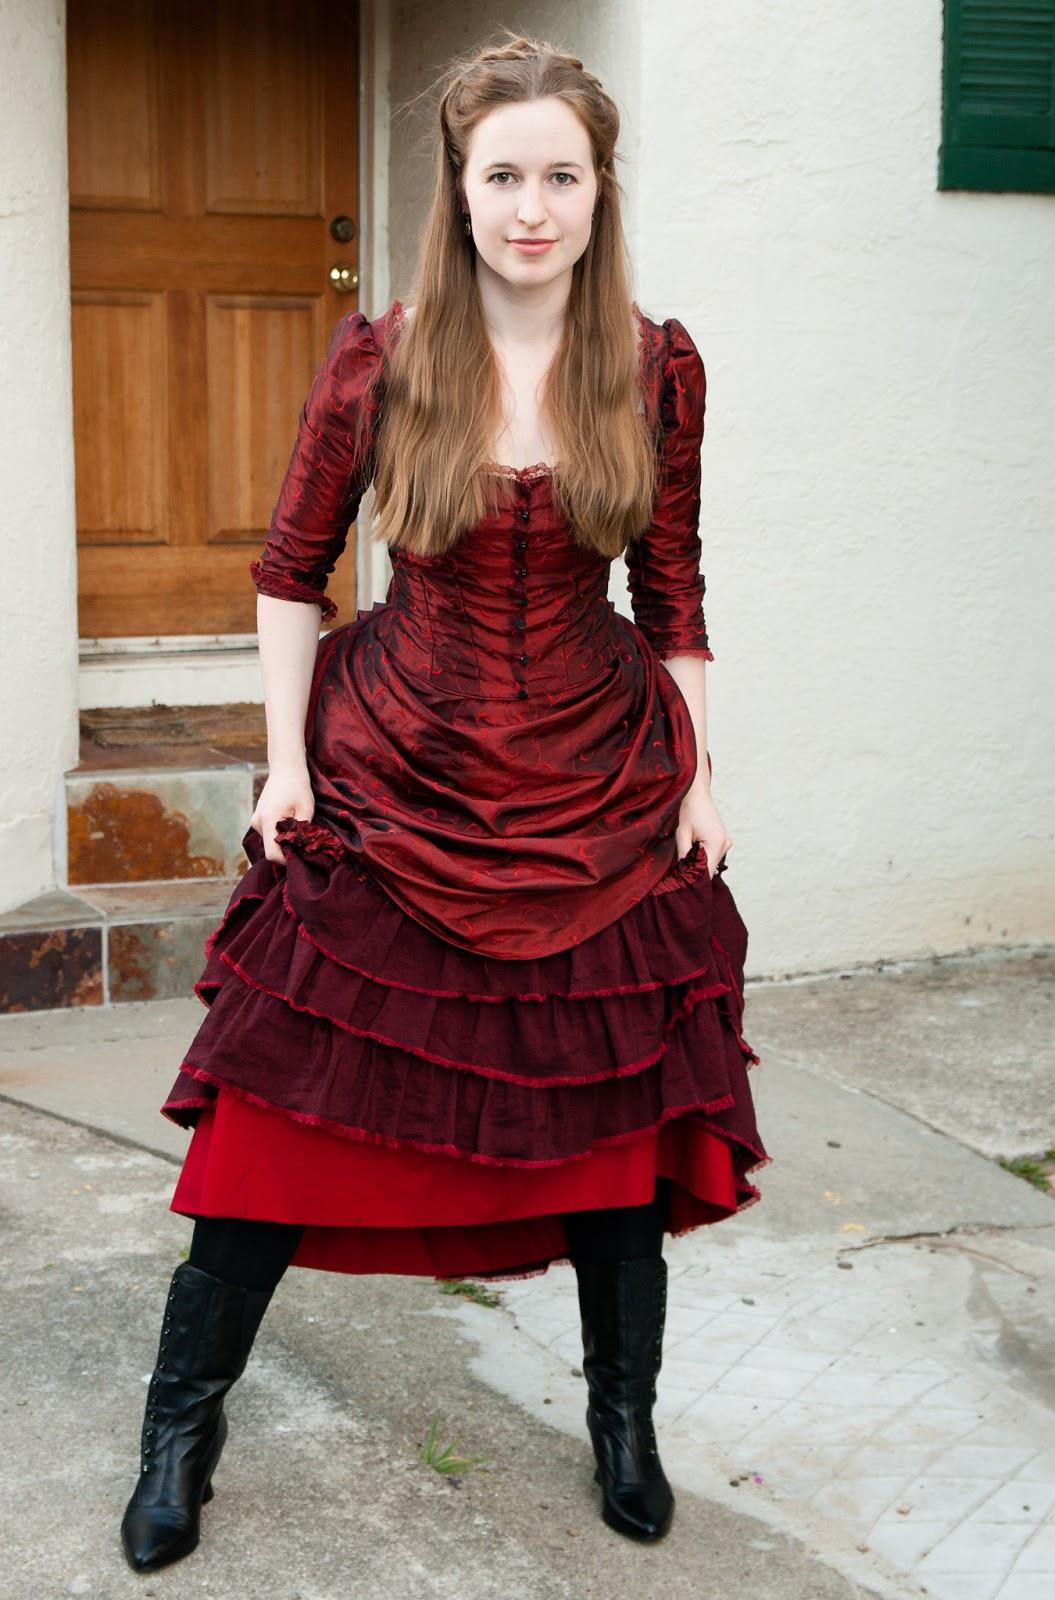 sc 1 st  Frolicking Frocks & Frolicking Frocks: Clara the Barmaid Bustle Dress